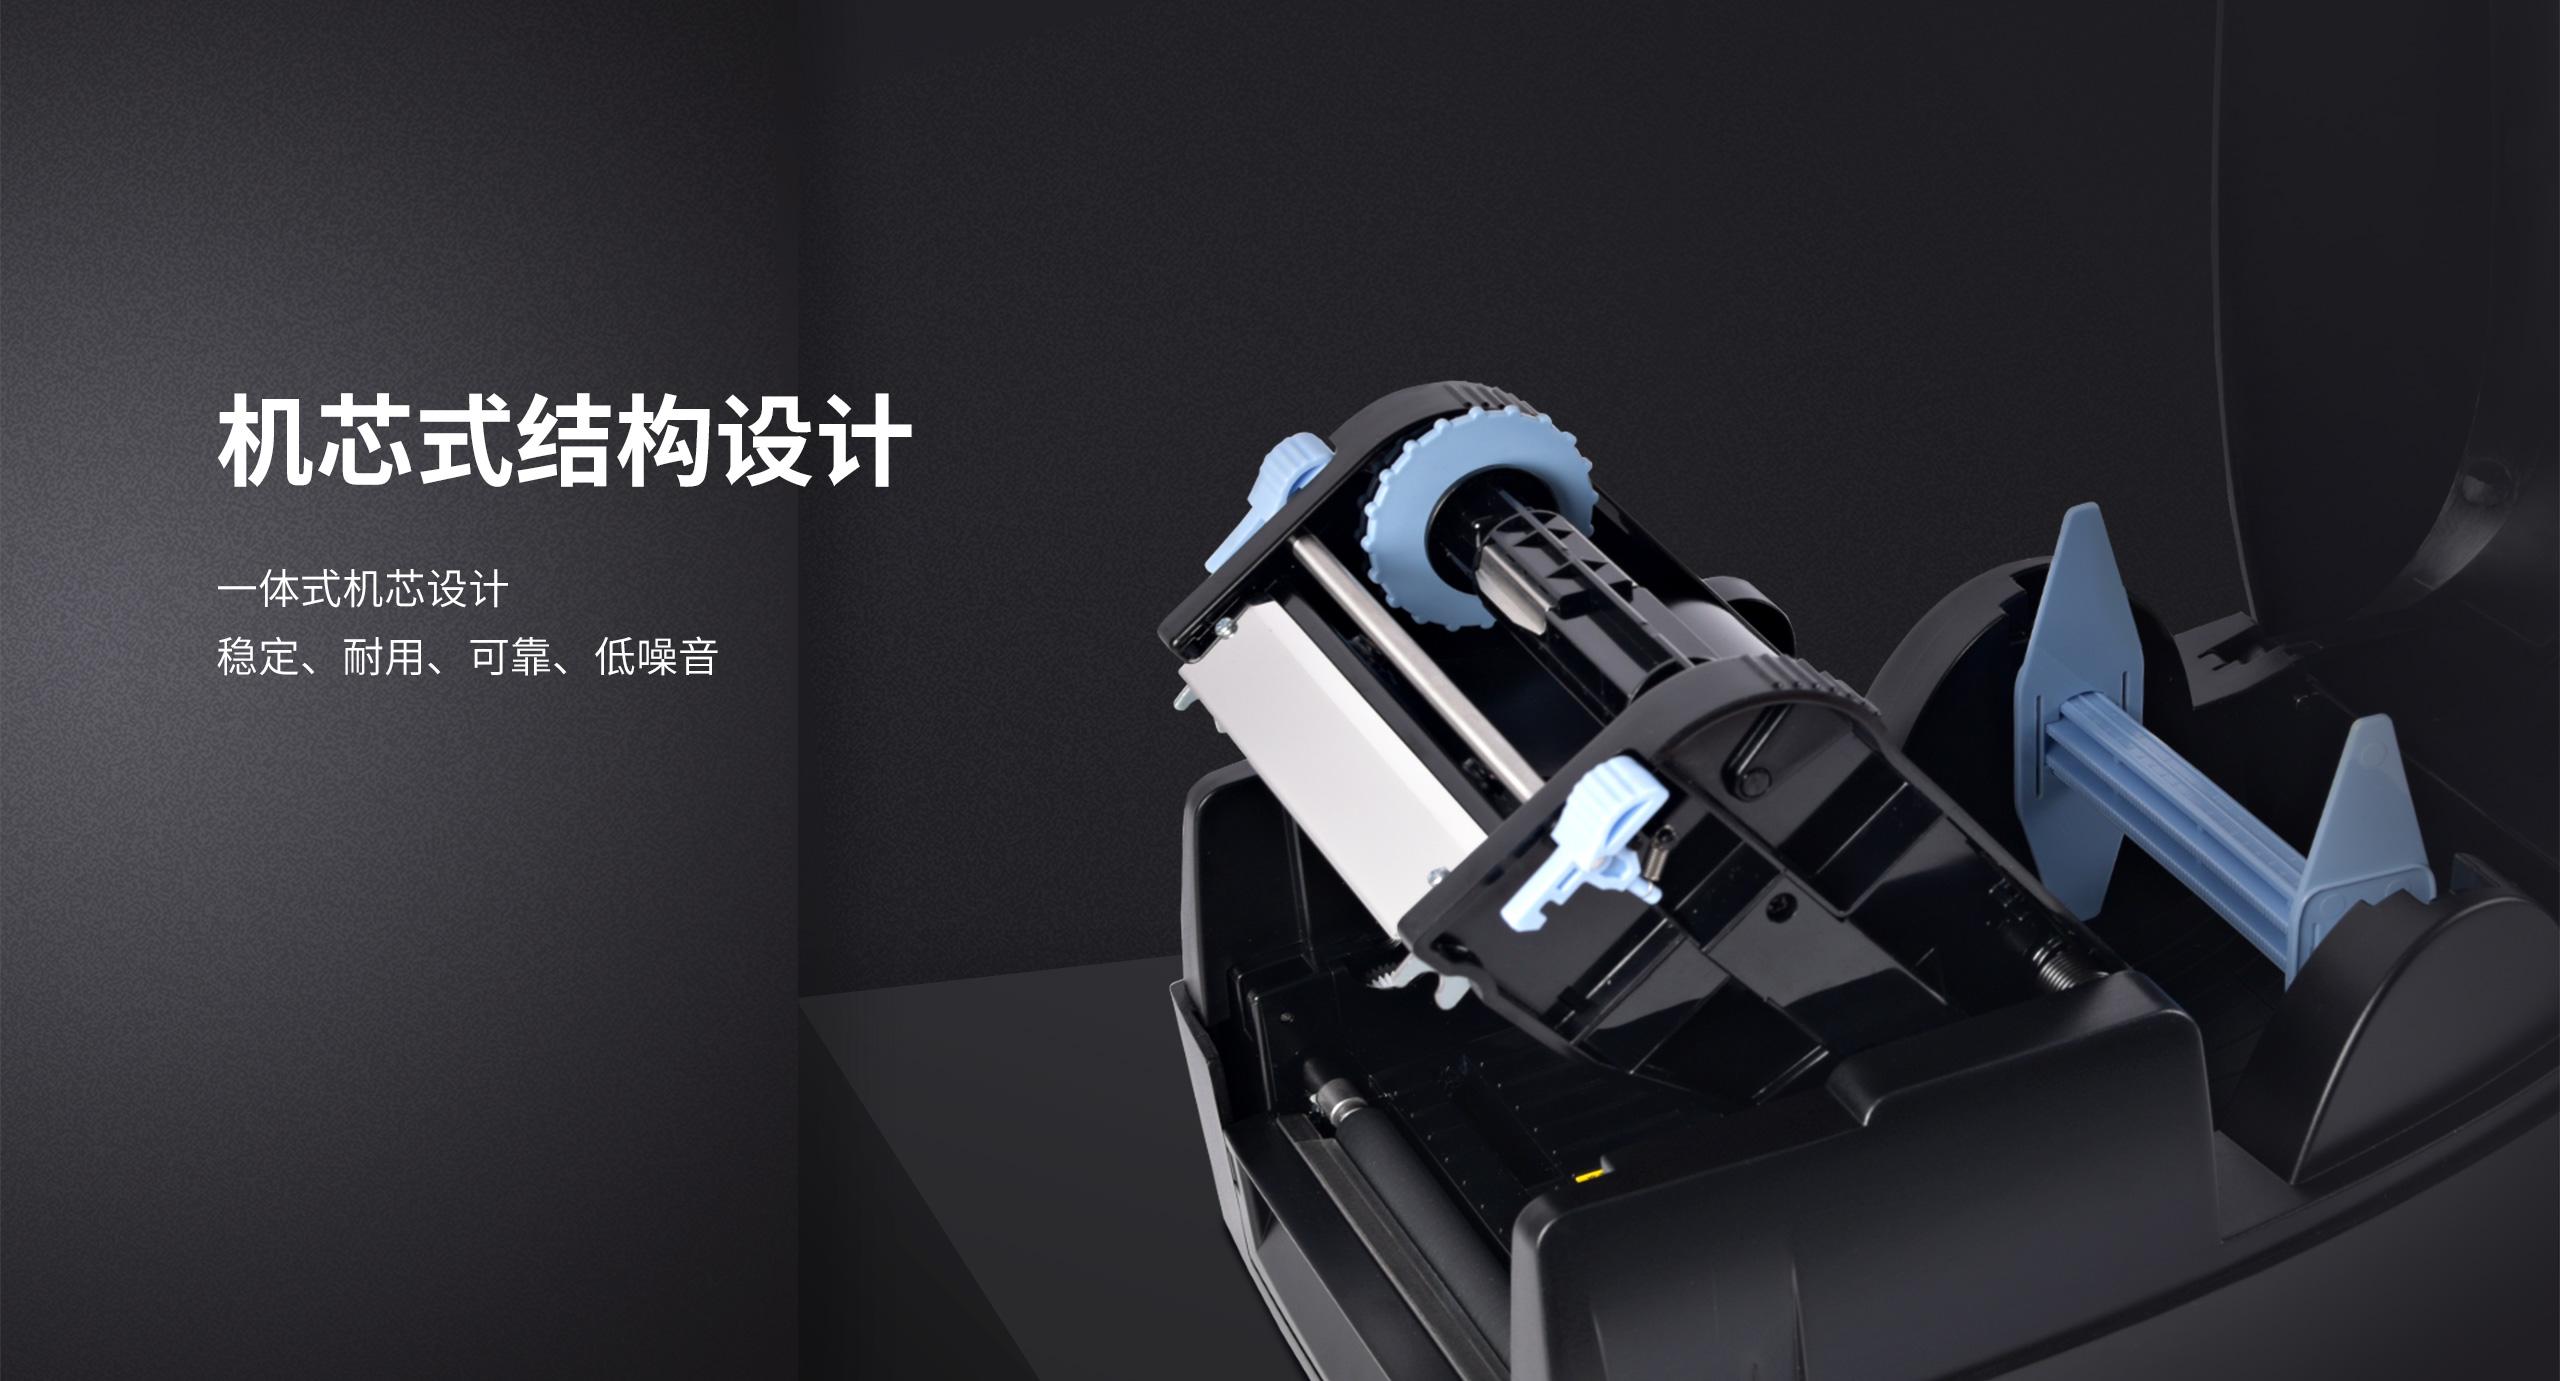 HT300/HT330条码打印机  第3张